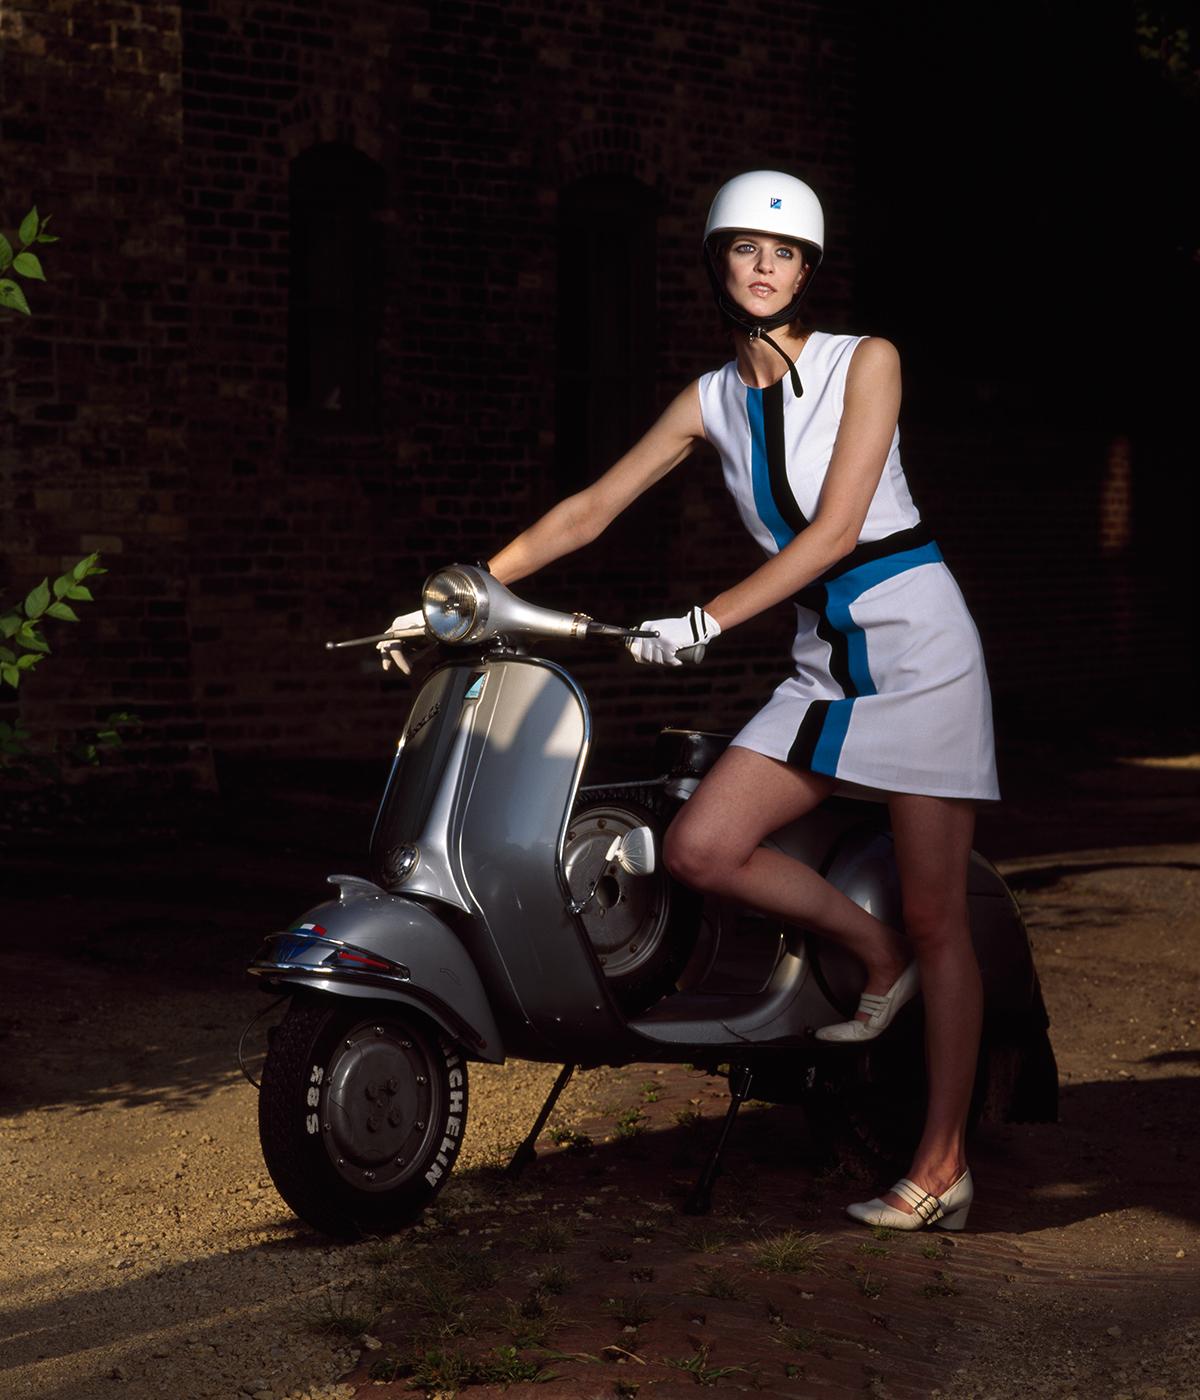 Italian Scooter, 2006